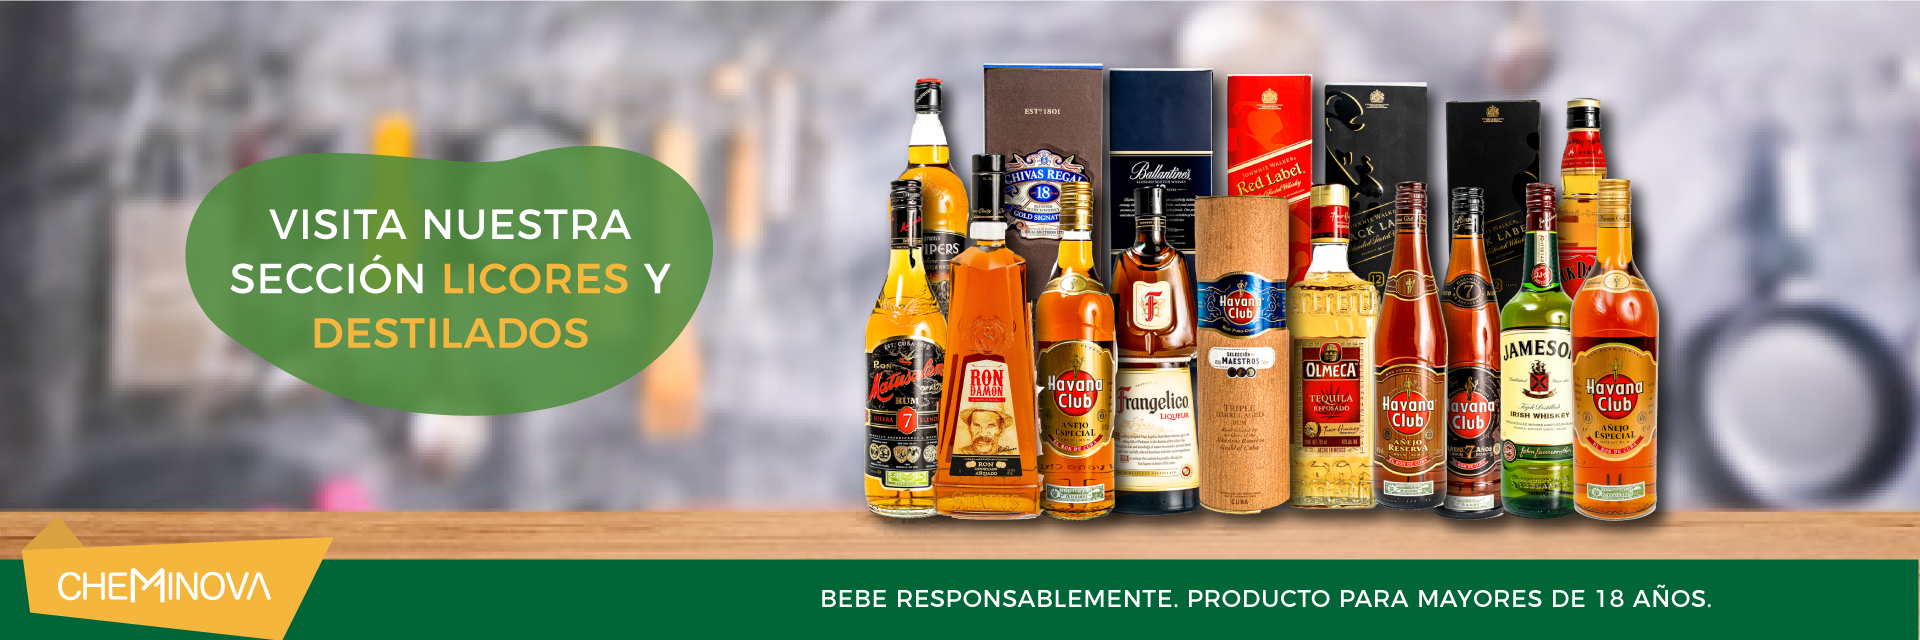 Banner_Bebidas_Alcohólicas_28Jul21.png